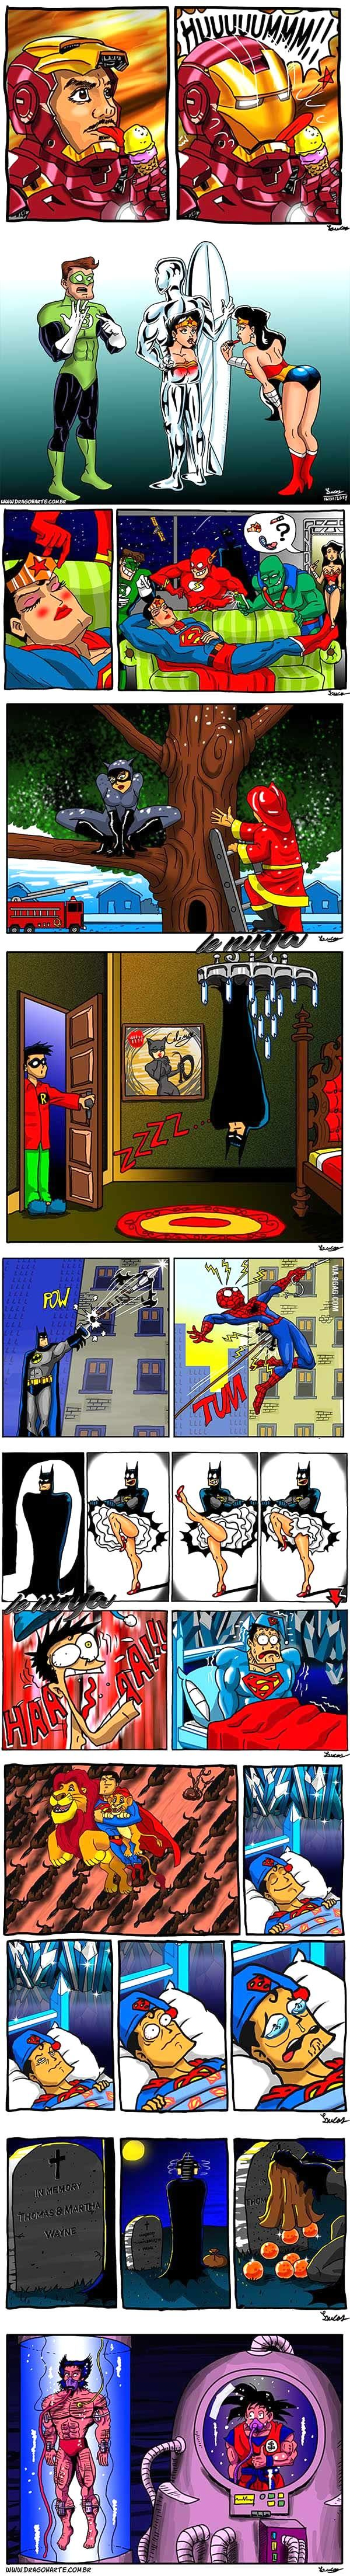 Super Heroes fun time